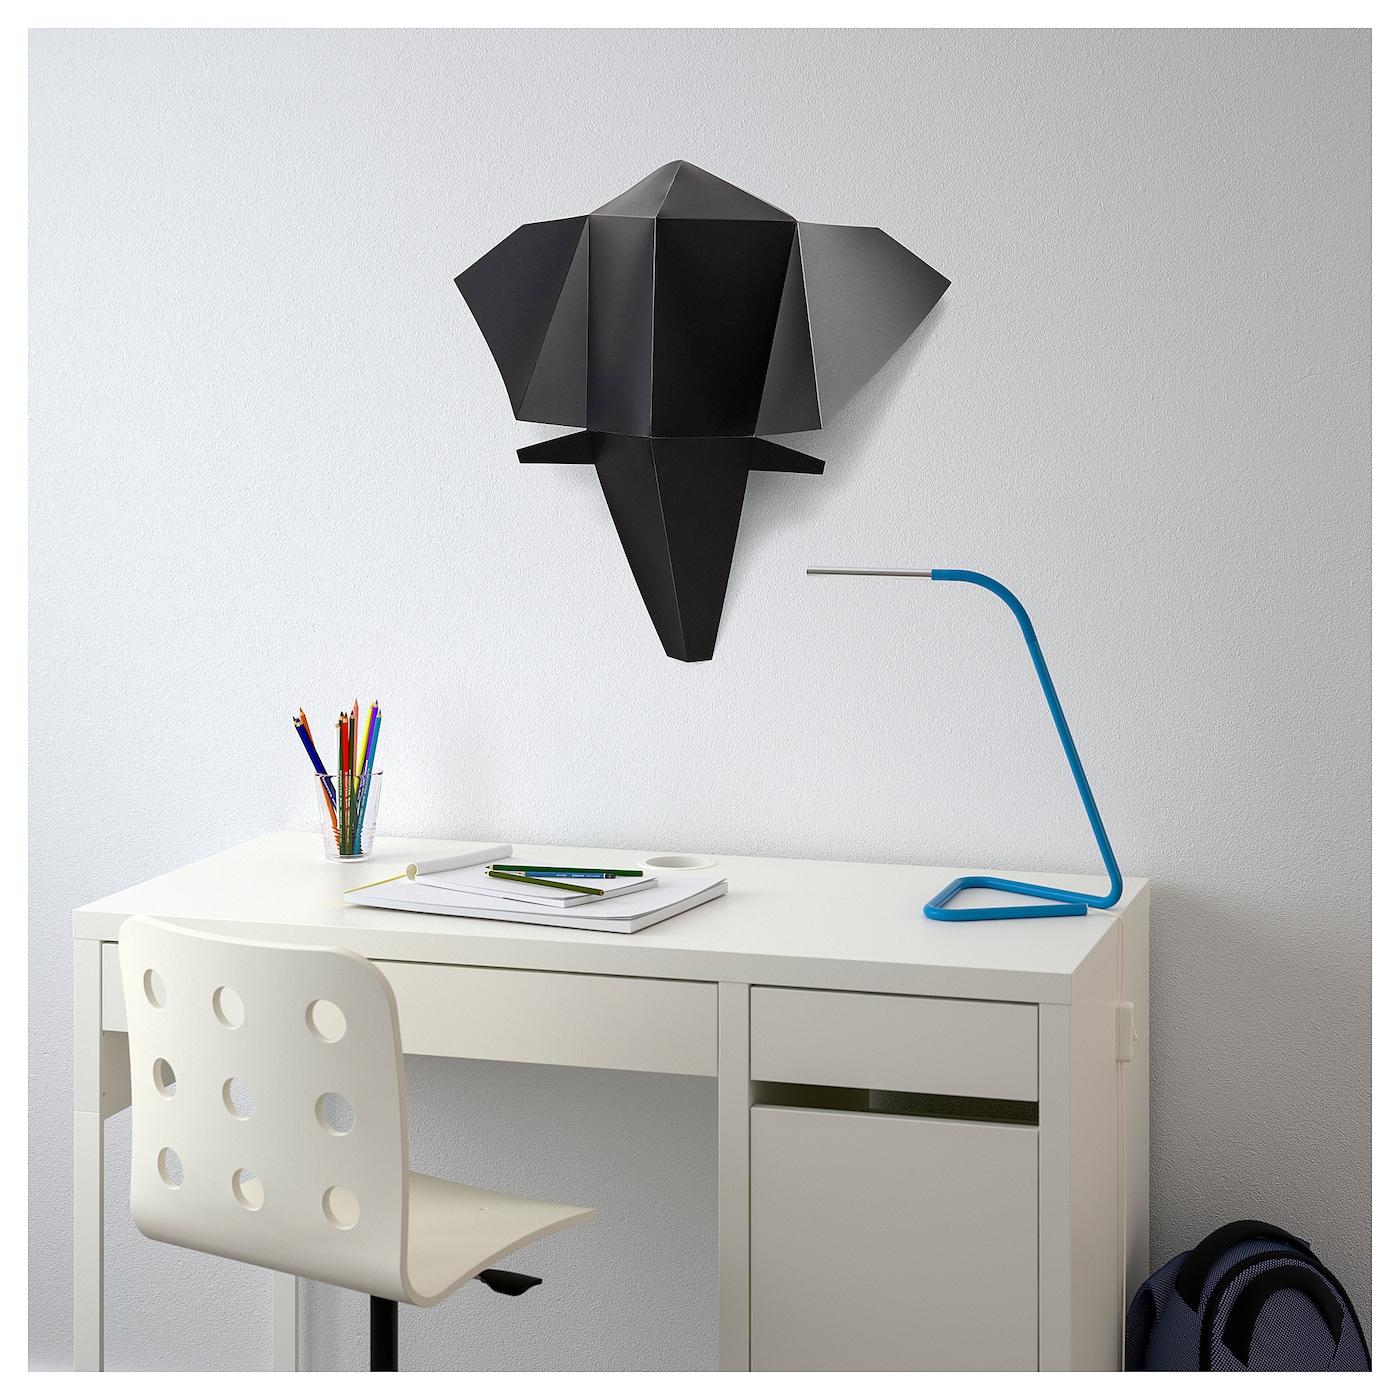 sommar 2018 wall decoration elephant 47x41 cm ikea. Black Bedroom Furniture Sets. Home Design Ideas